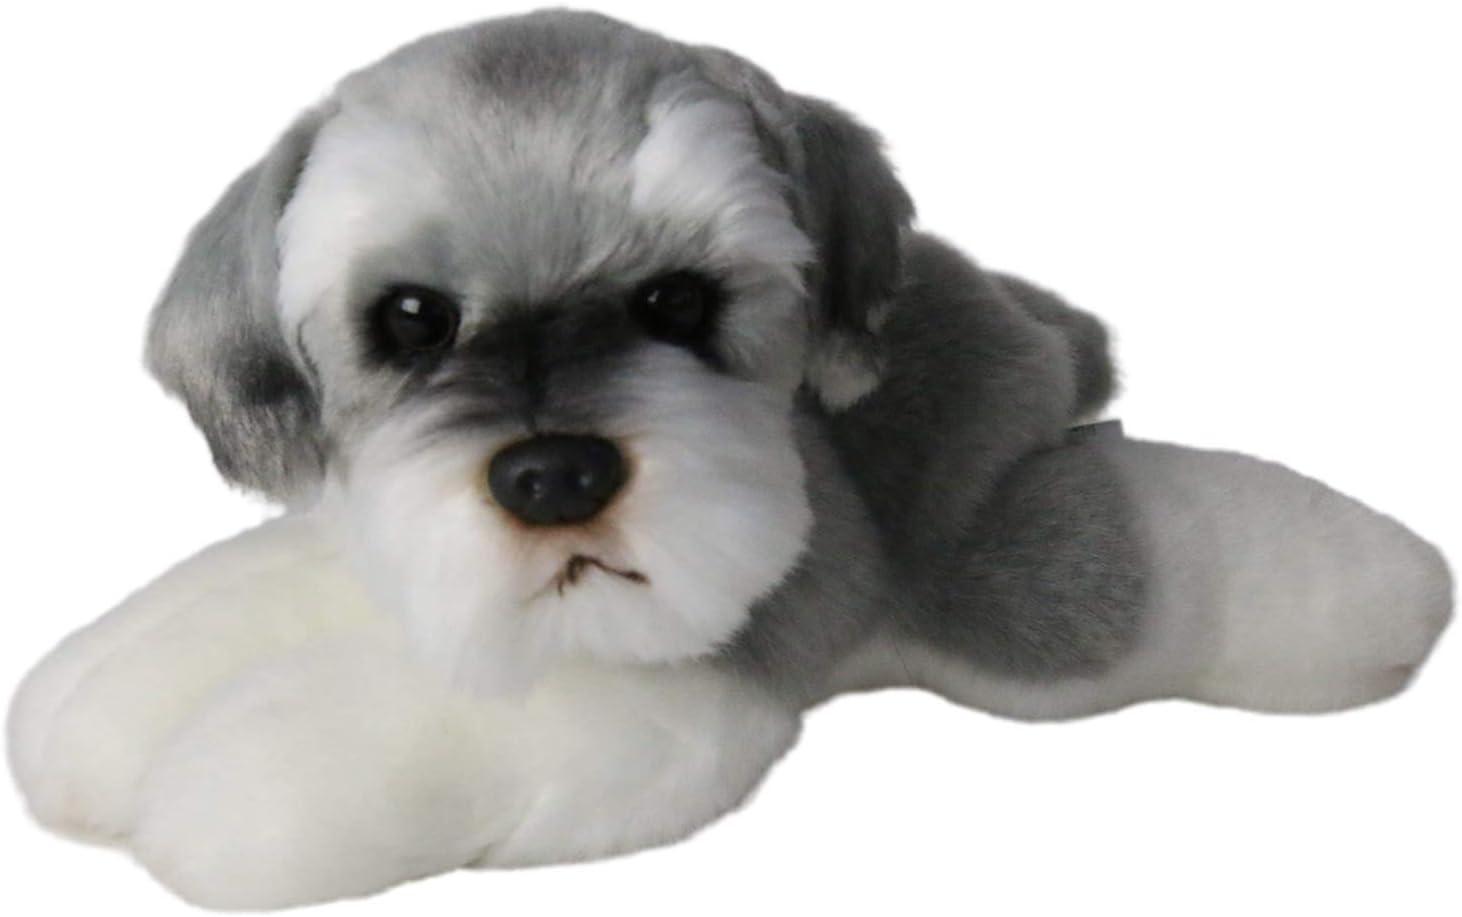 caralin Handmade Simulation Standard Schnauzer Dog Toy Doll Stuf